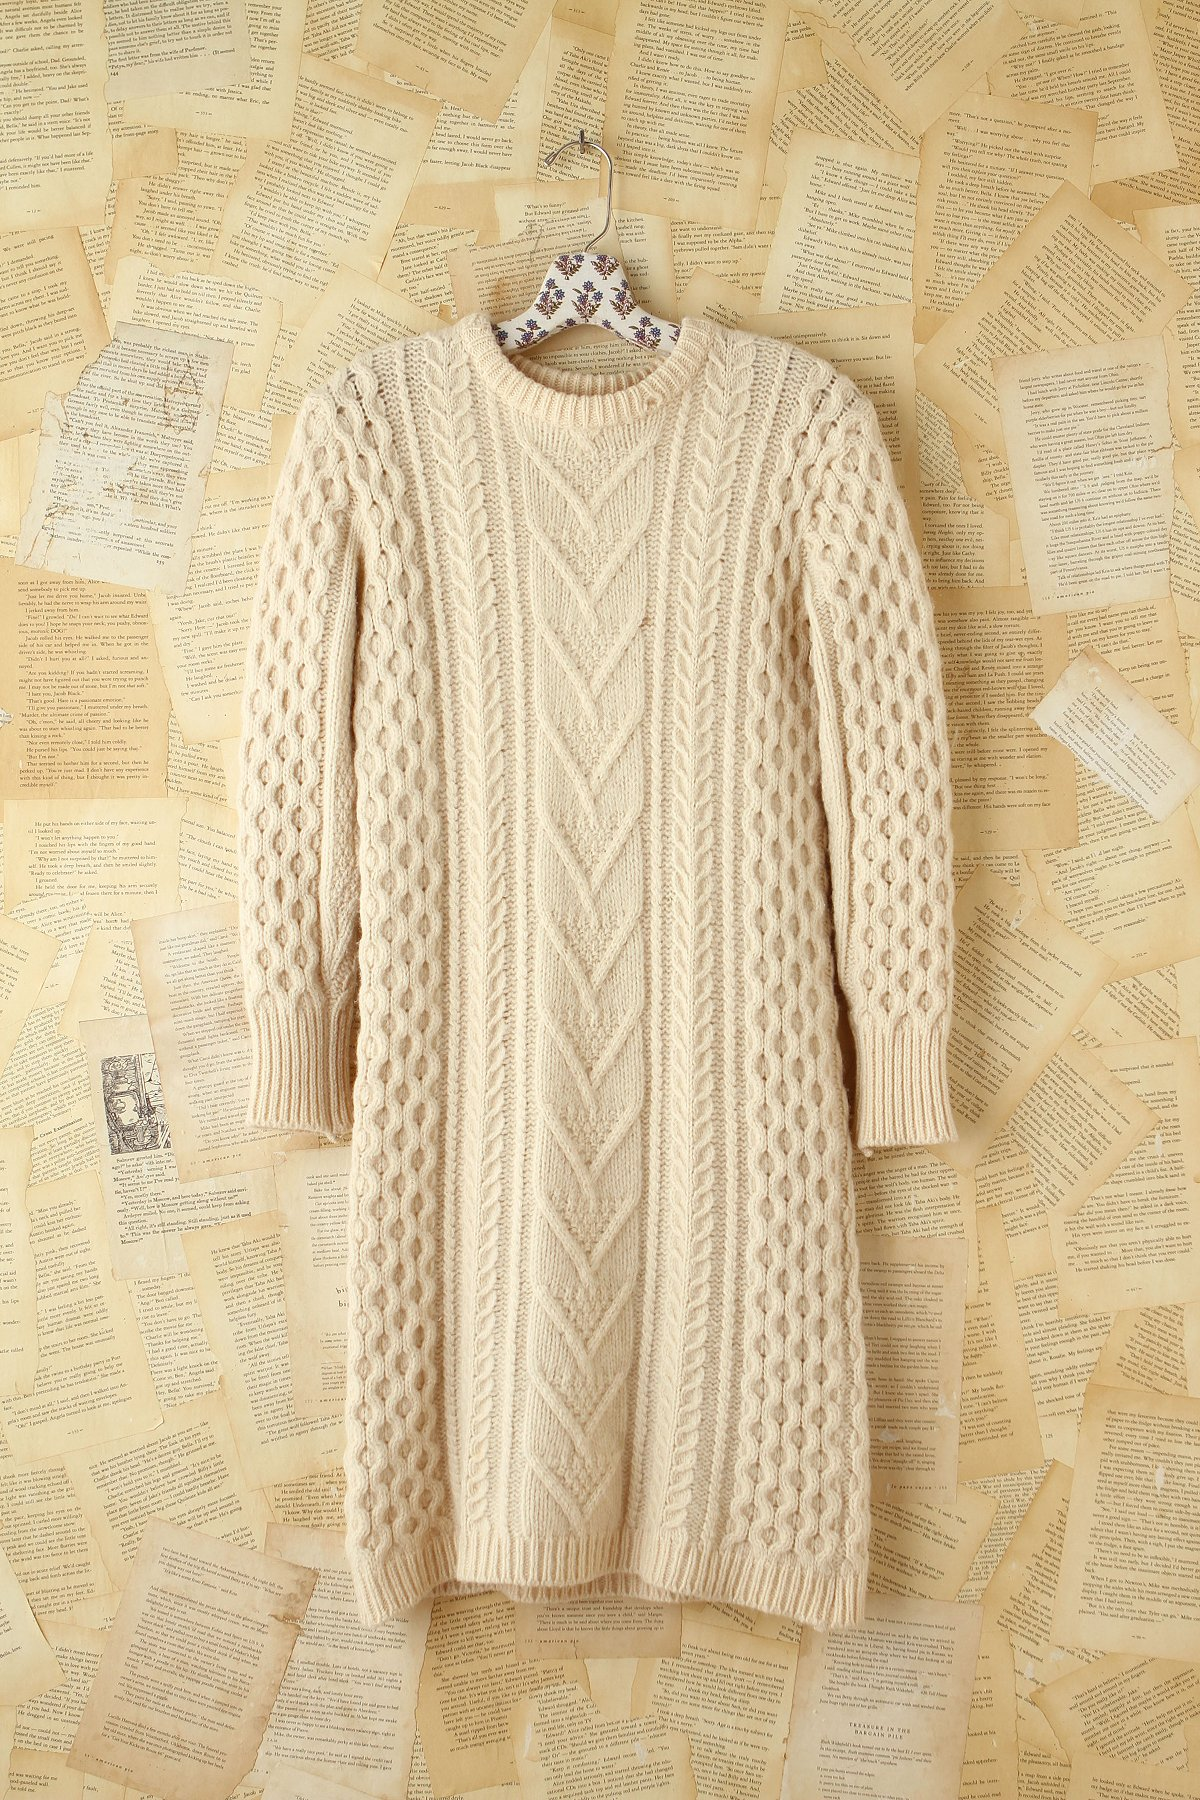 Vintage Maxi Wool Sweater Dress